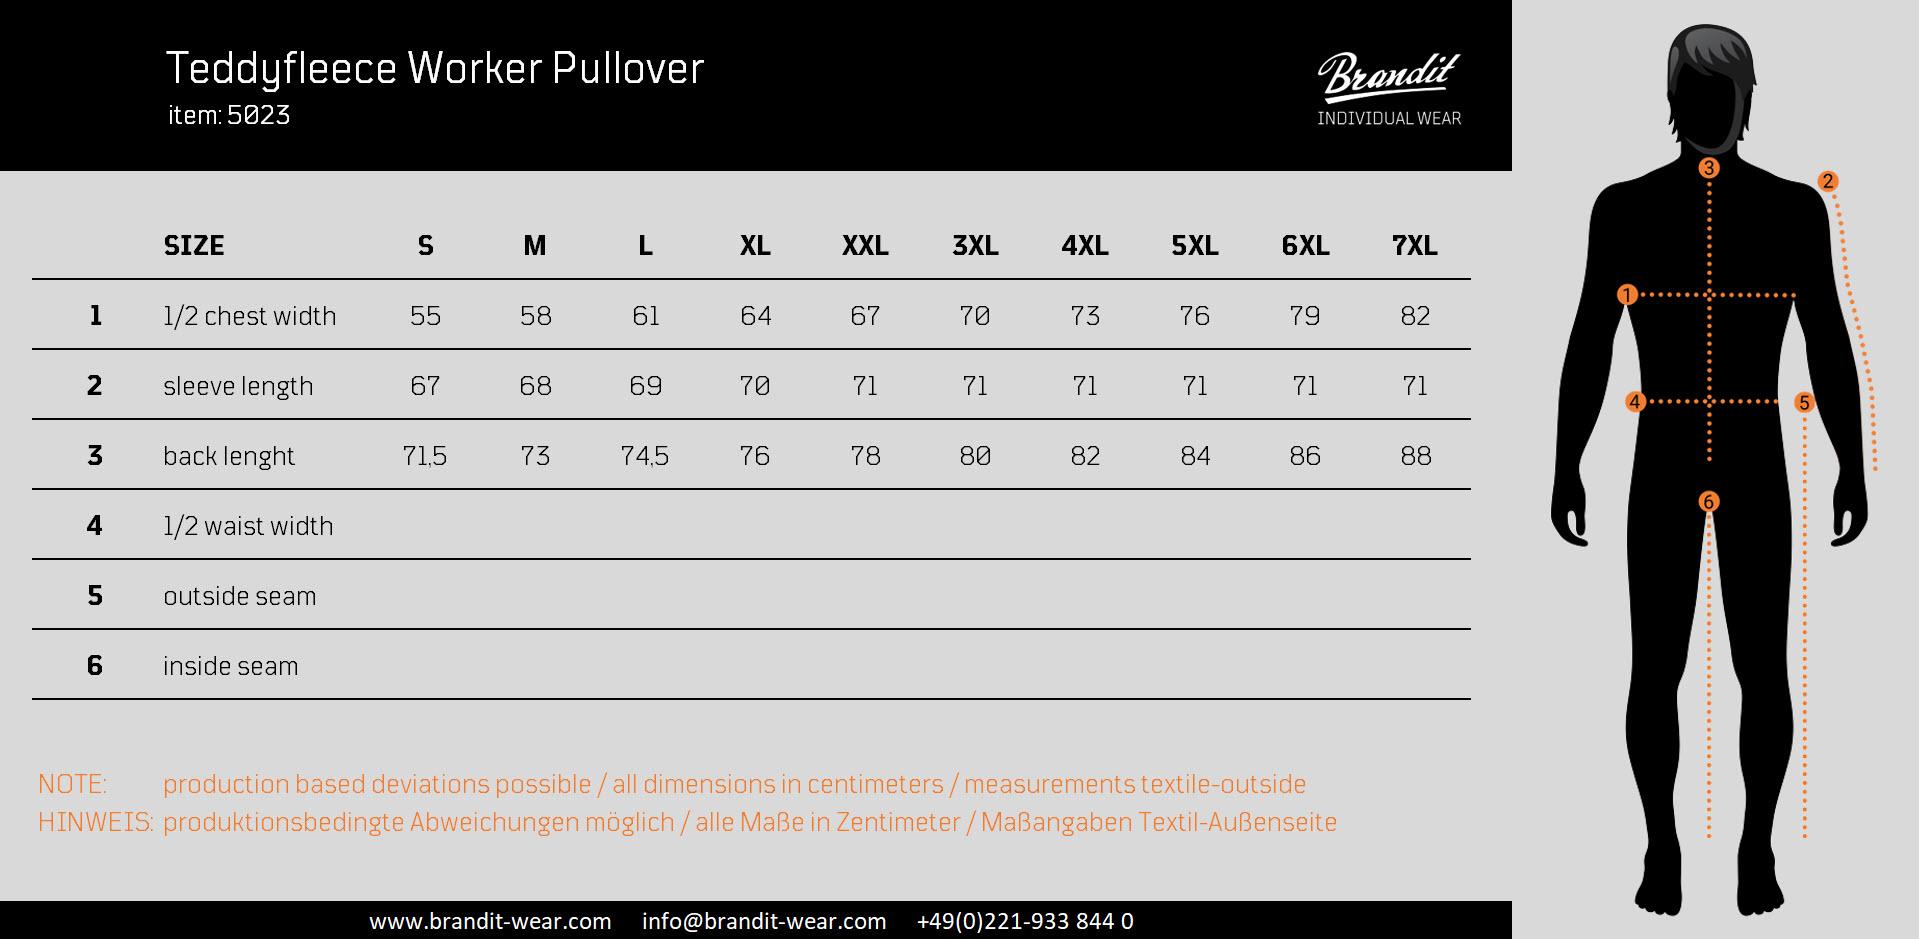 5023-Teddyfleece-Worker-PulloverTTNLmZ6DtYtnk